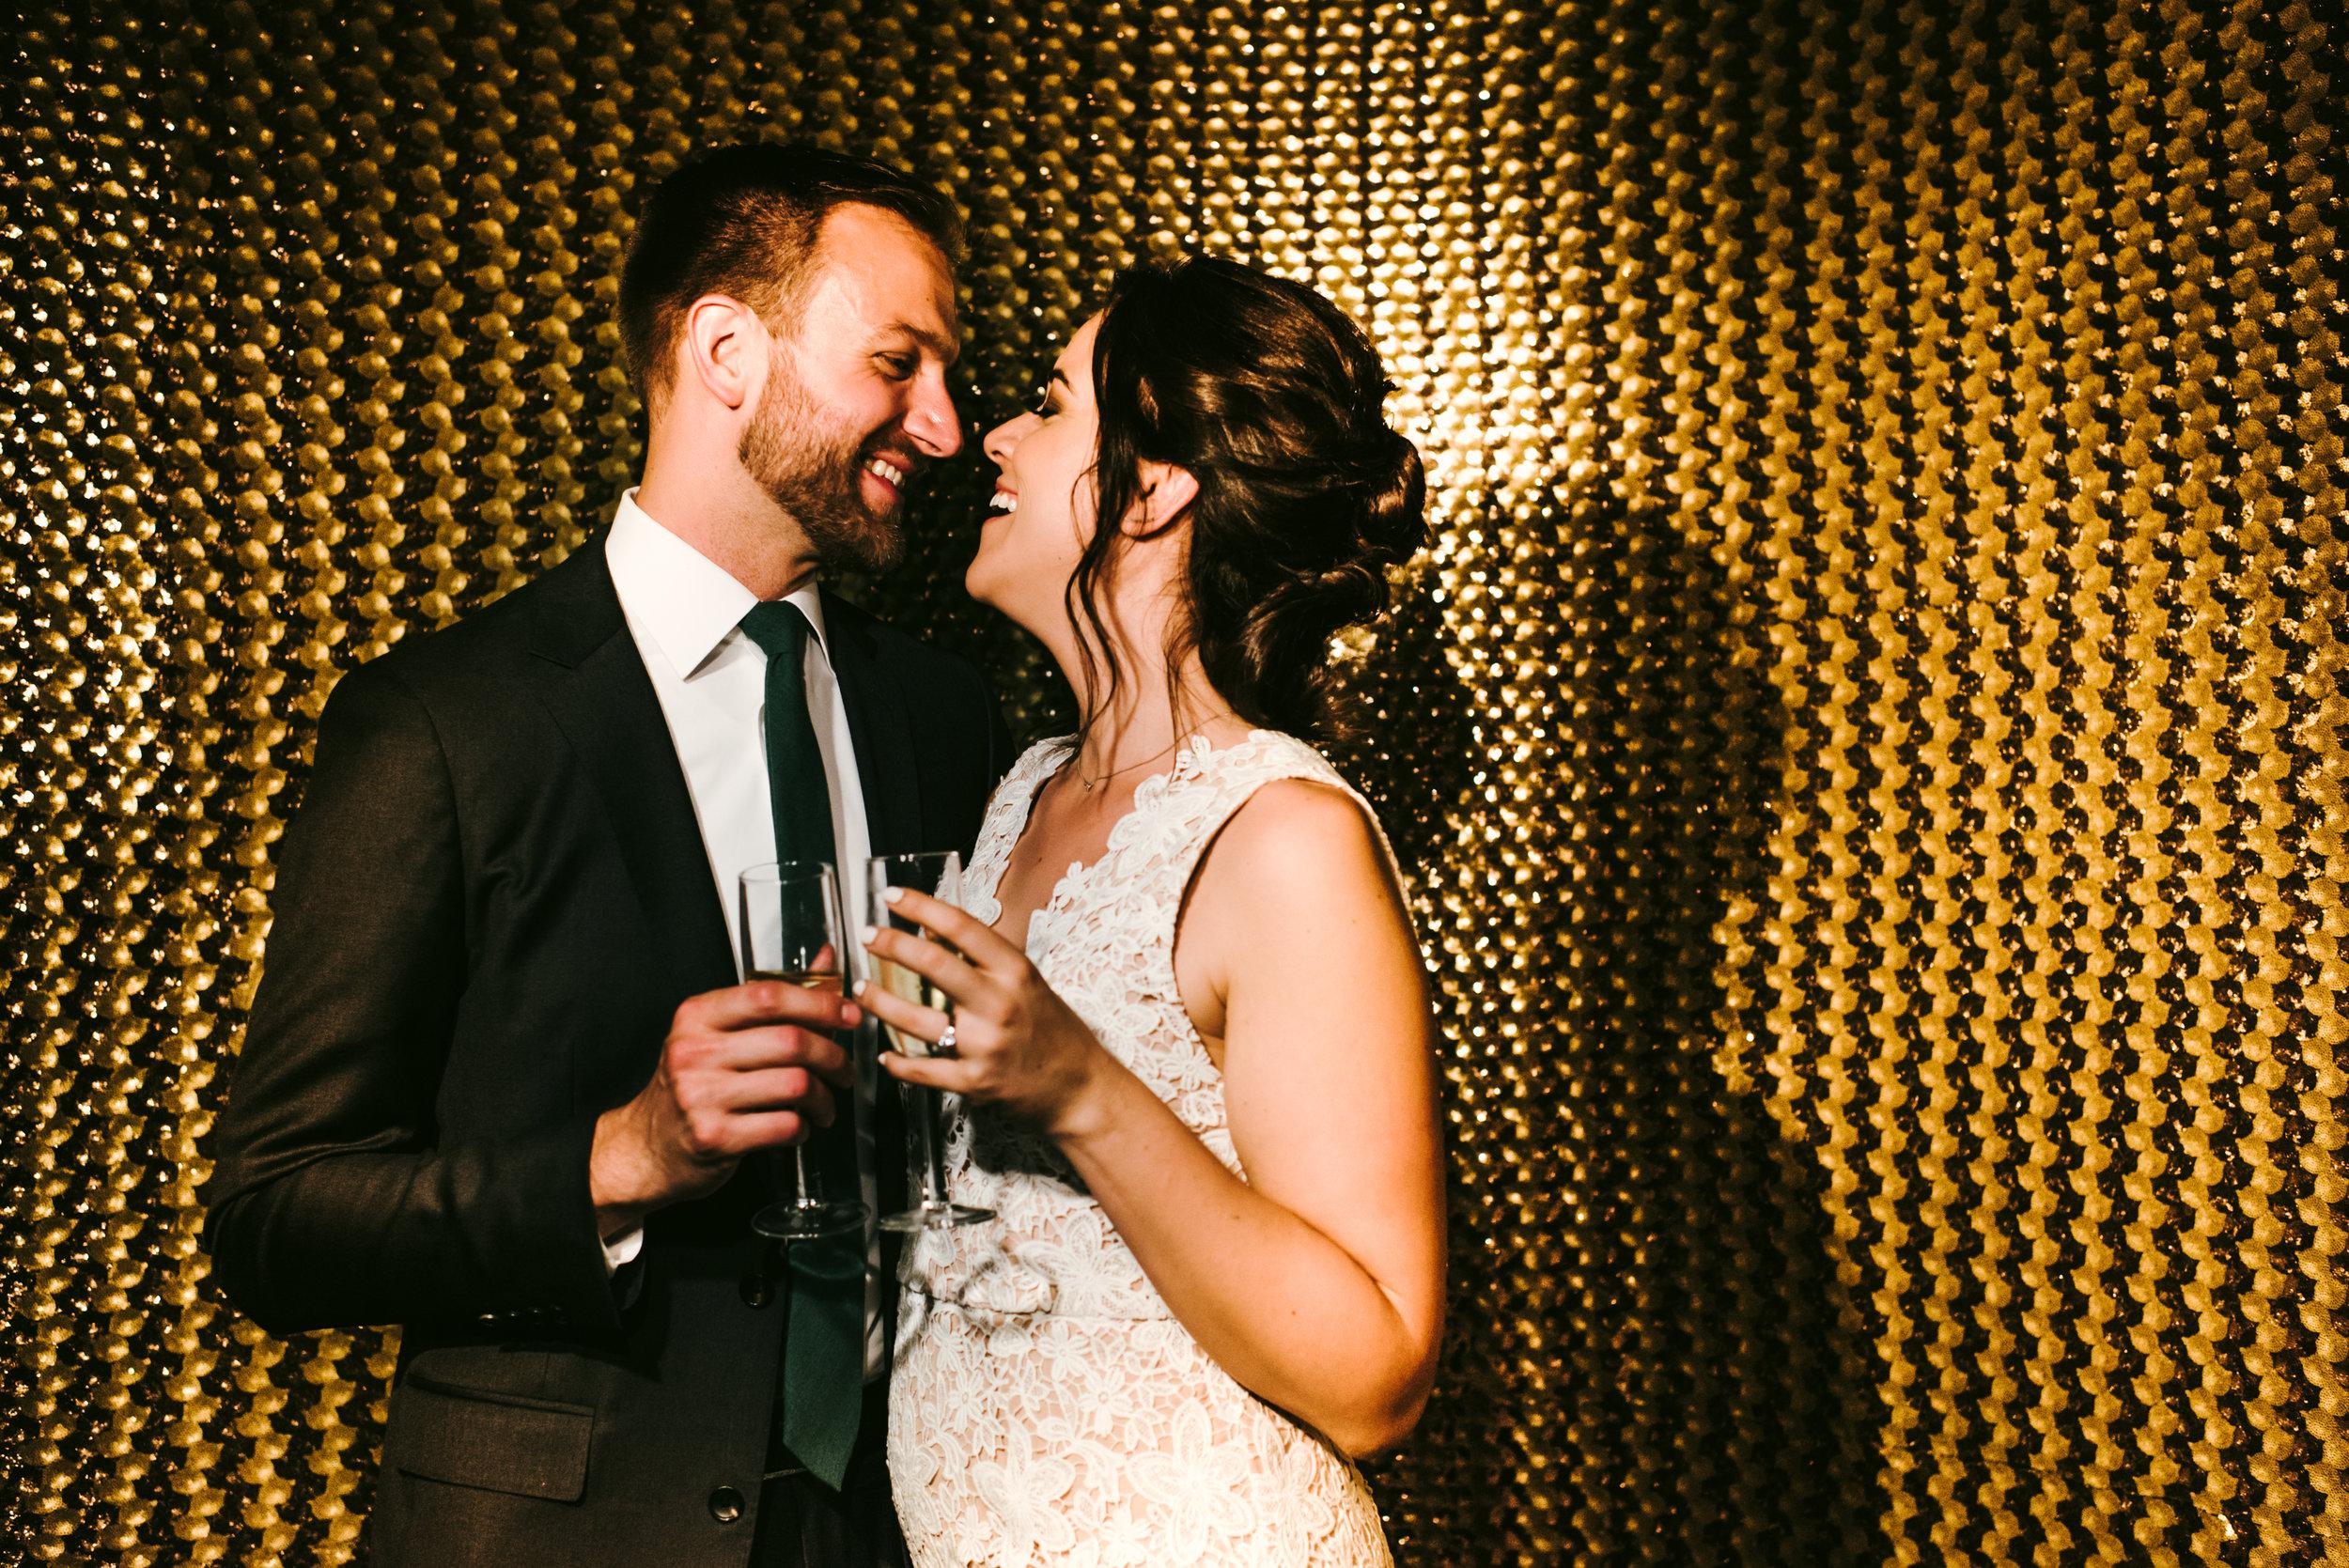 AMANDA & MATT - LE FANFARE NYC - INTIMATE WEDDING PHOTOGRAPHER by CHI-CHI ARI-713.jpg